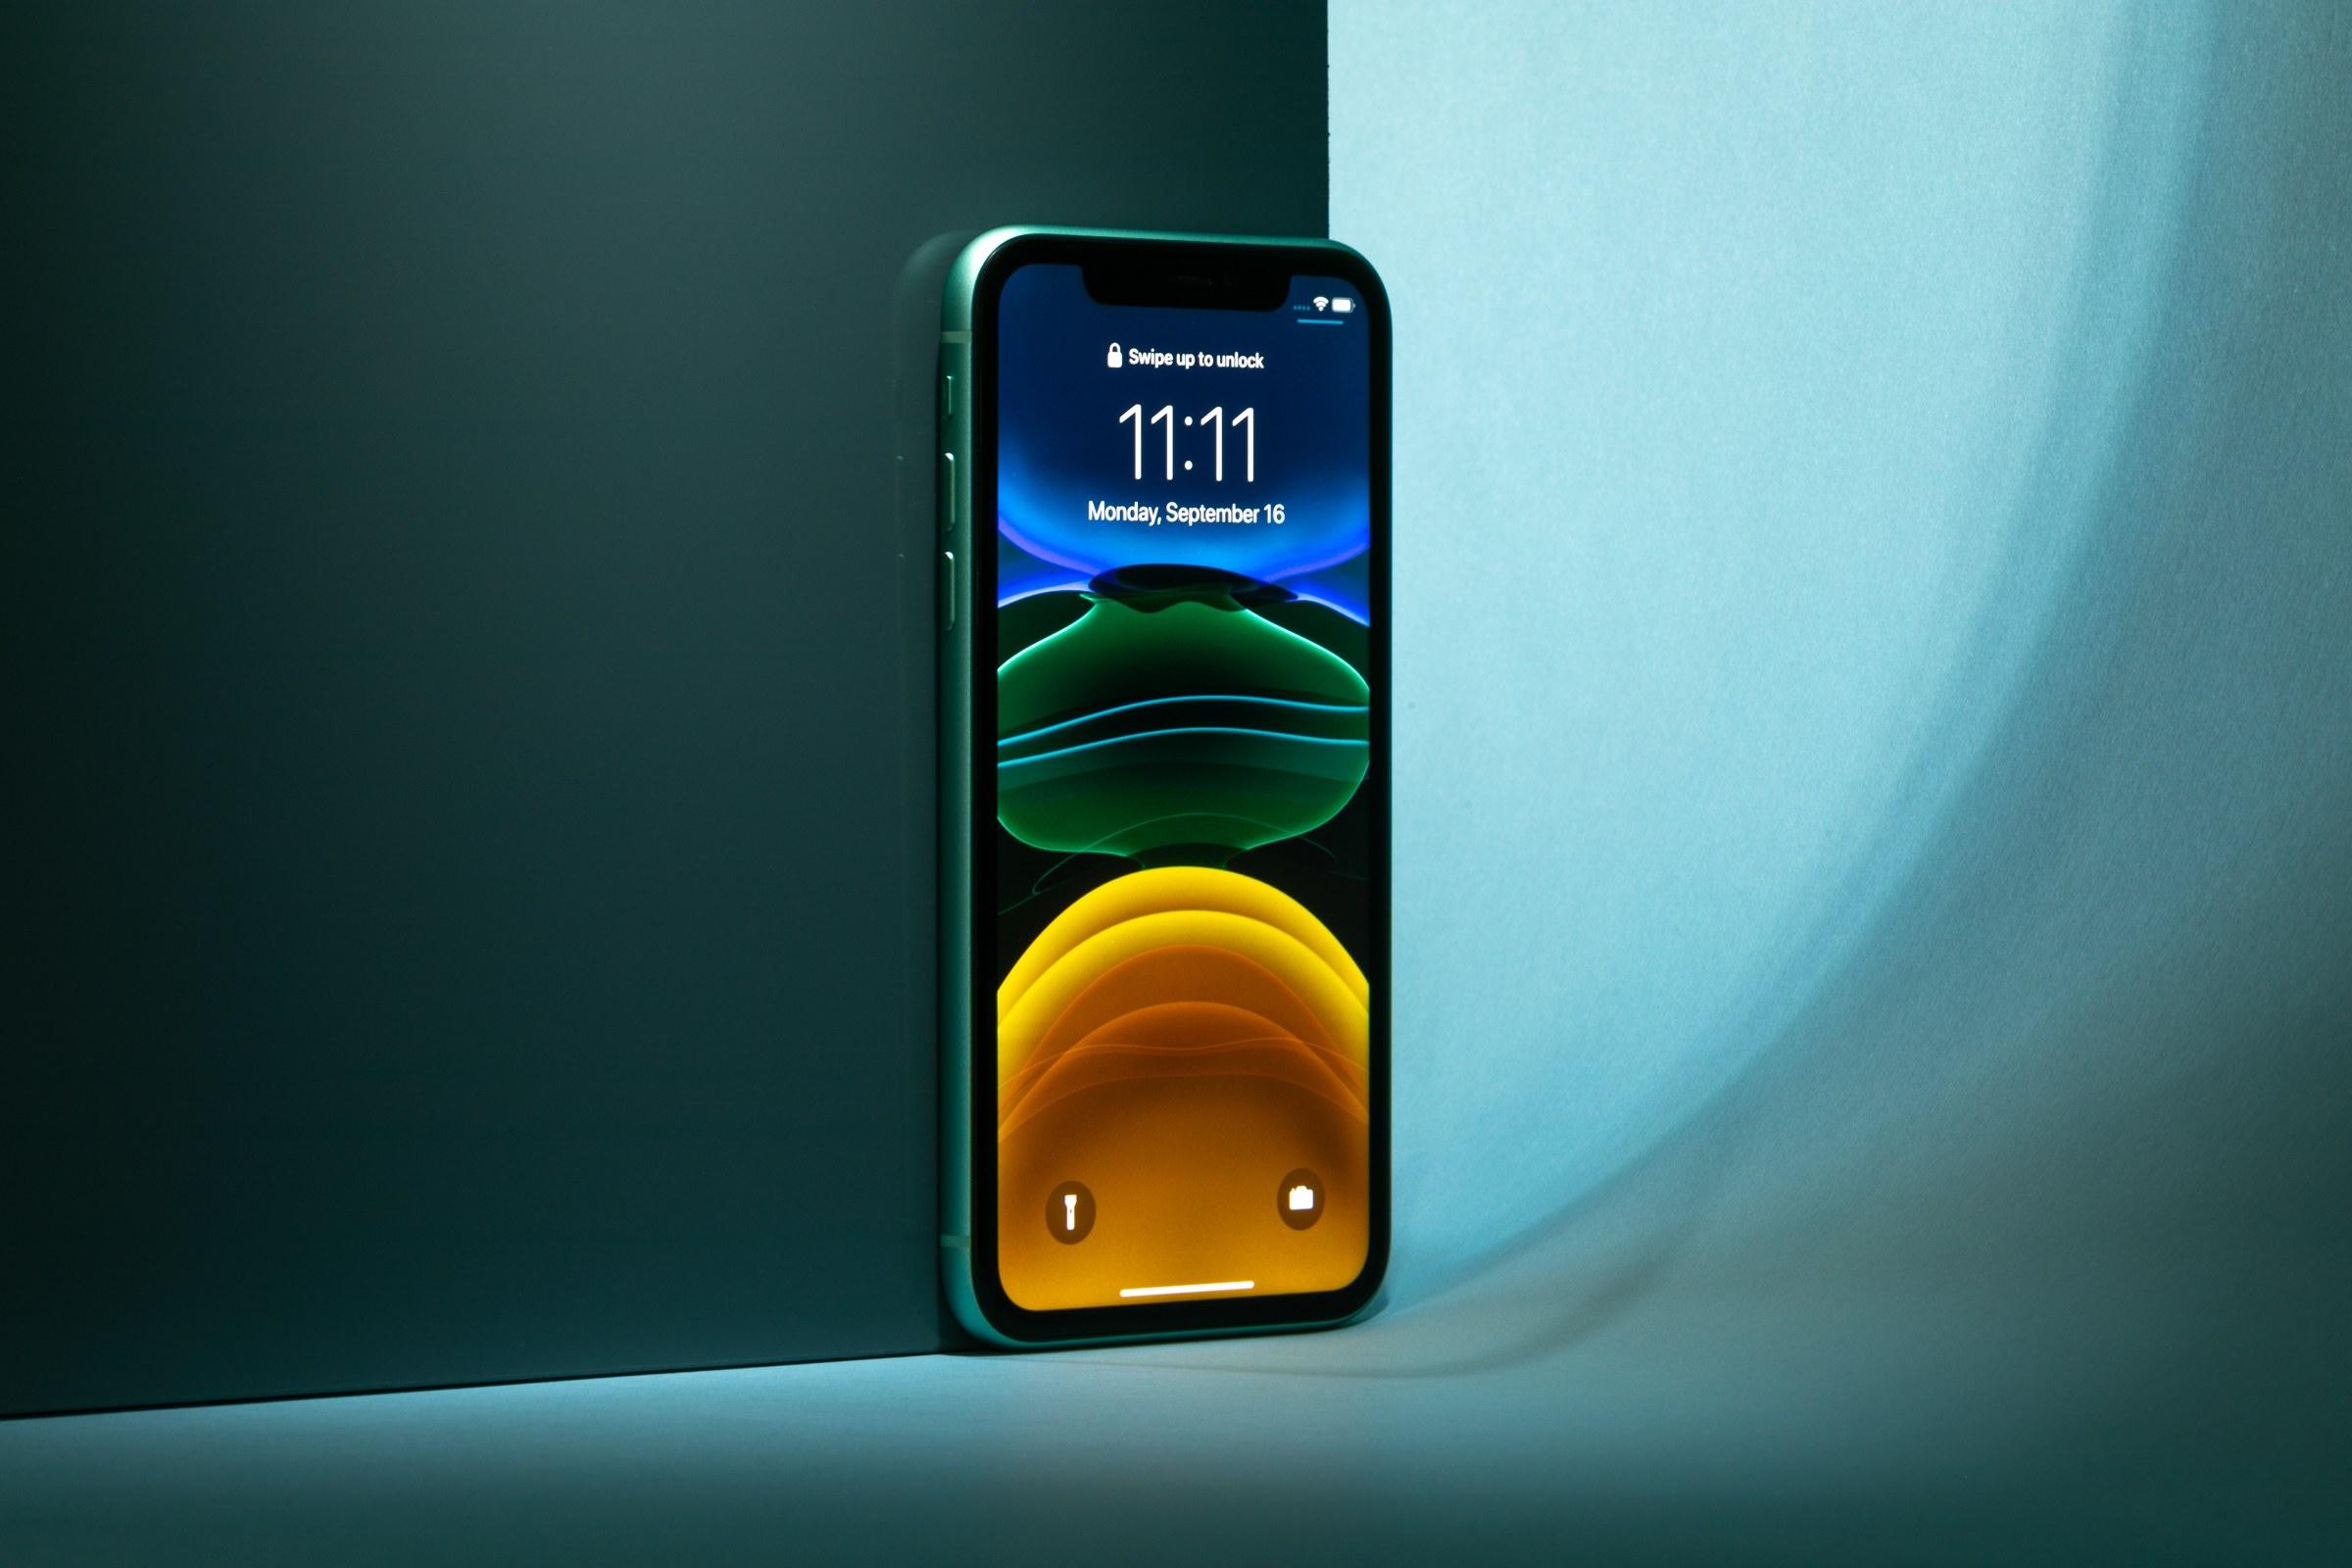 Apple Future Iphone 11 - HD Wallpaper